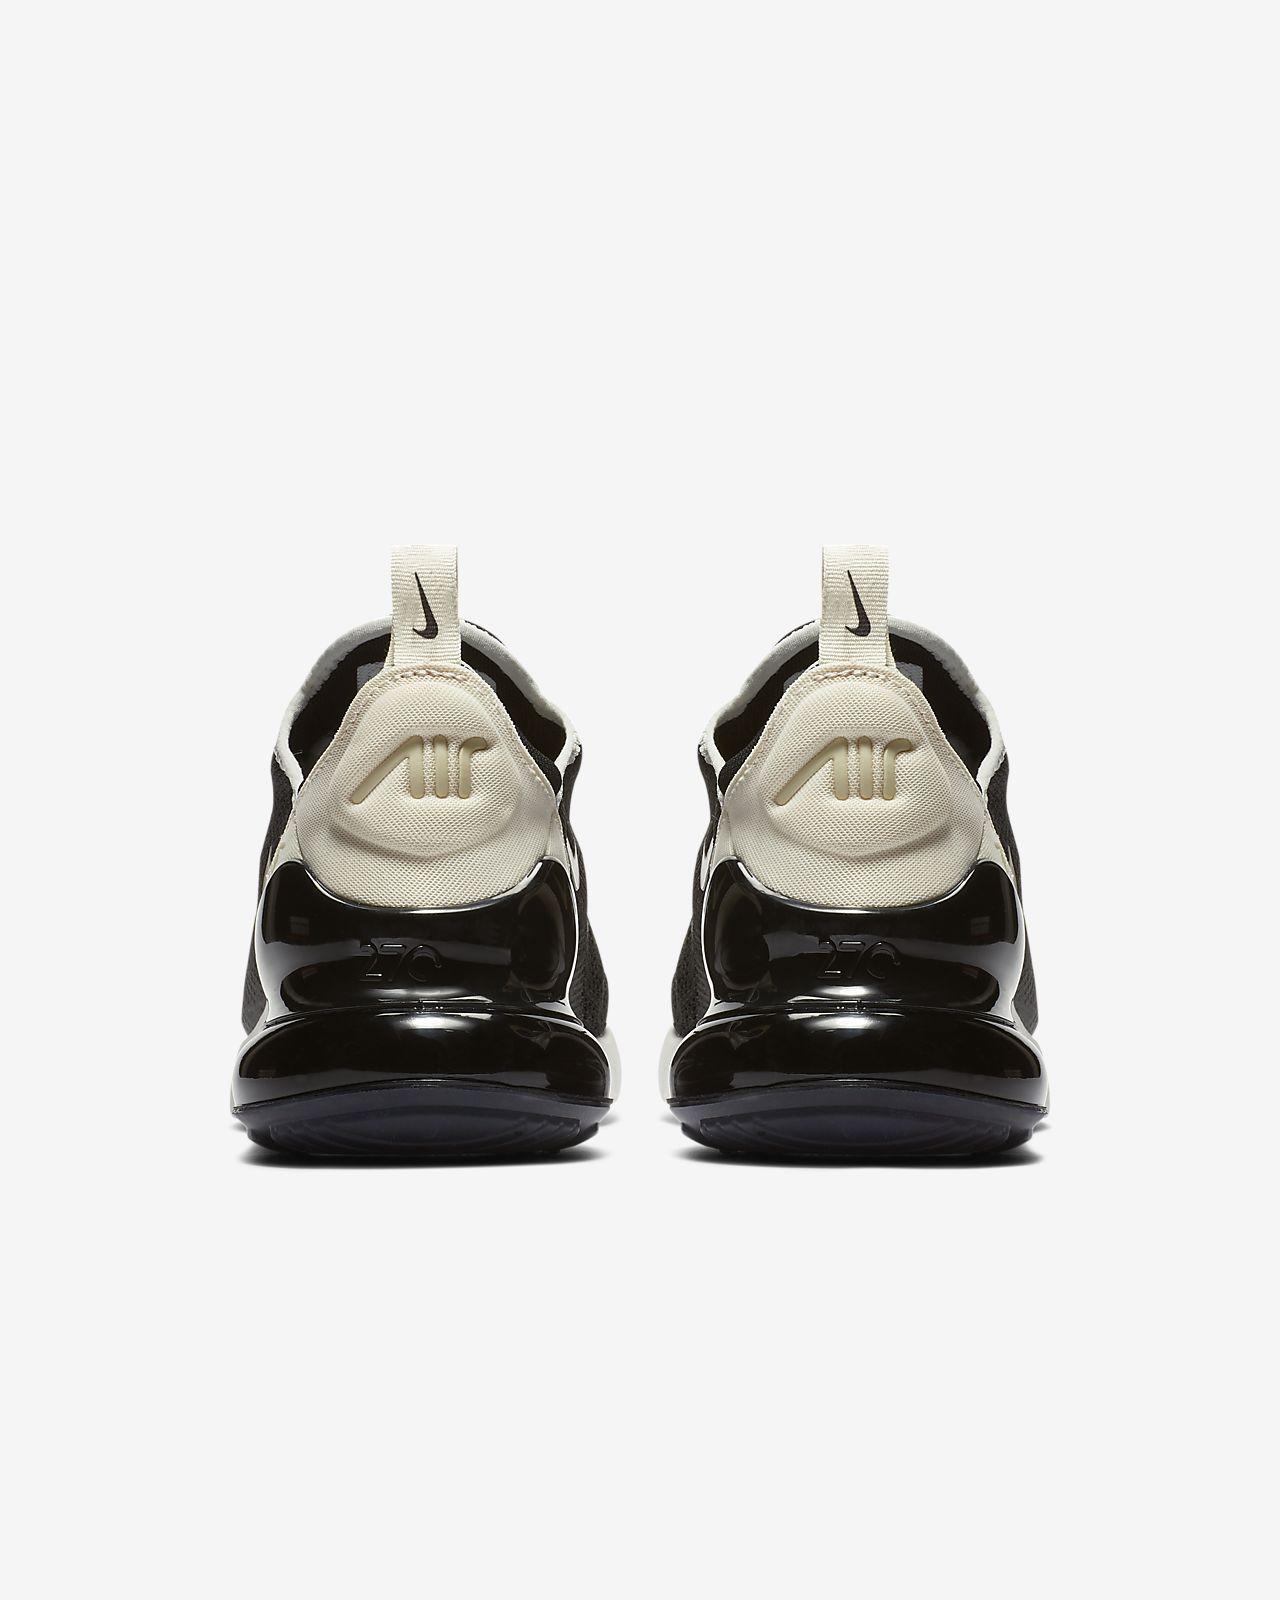 1236848a122cd1 Nike Air Max 270 Women s Shoe. Nike.com AU